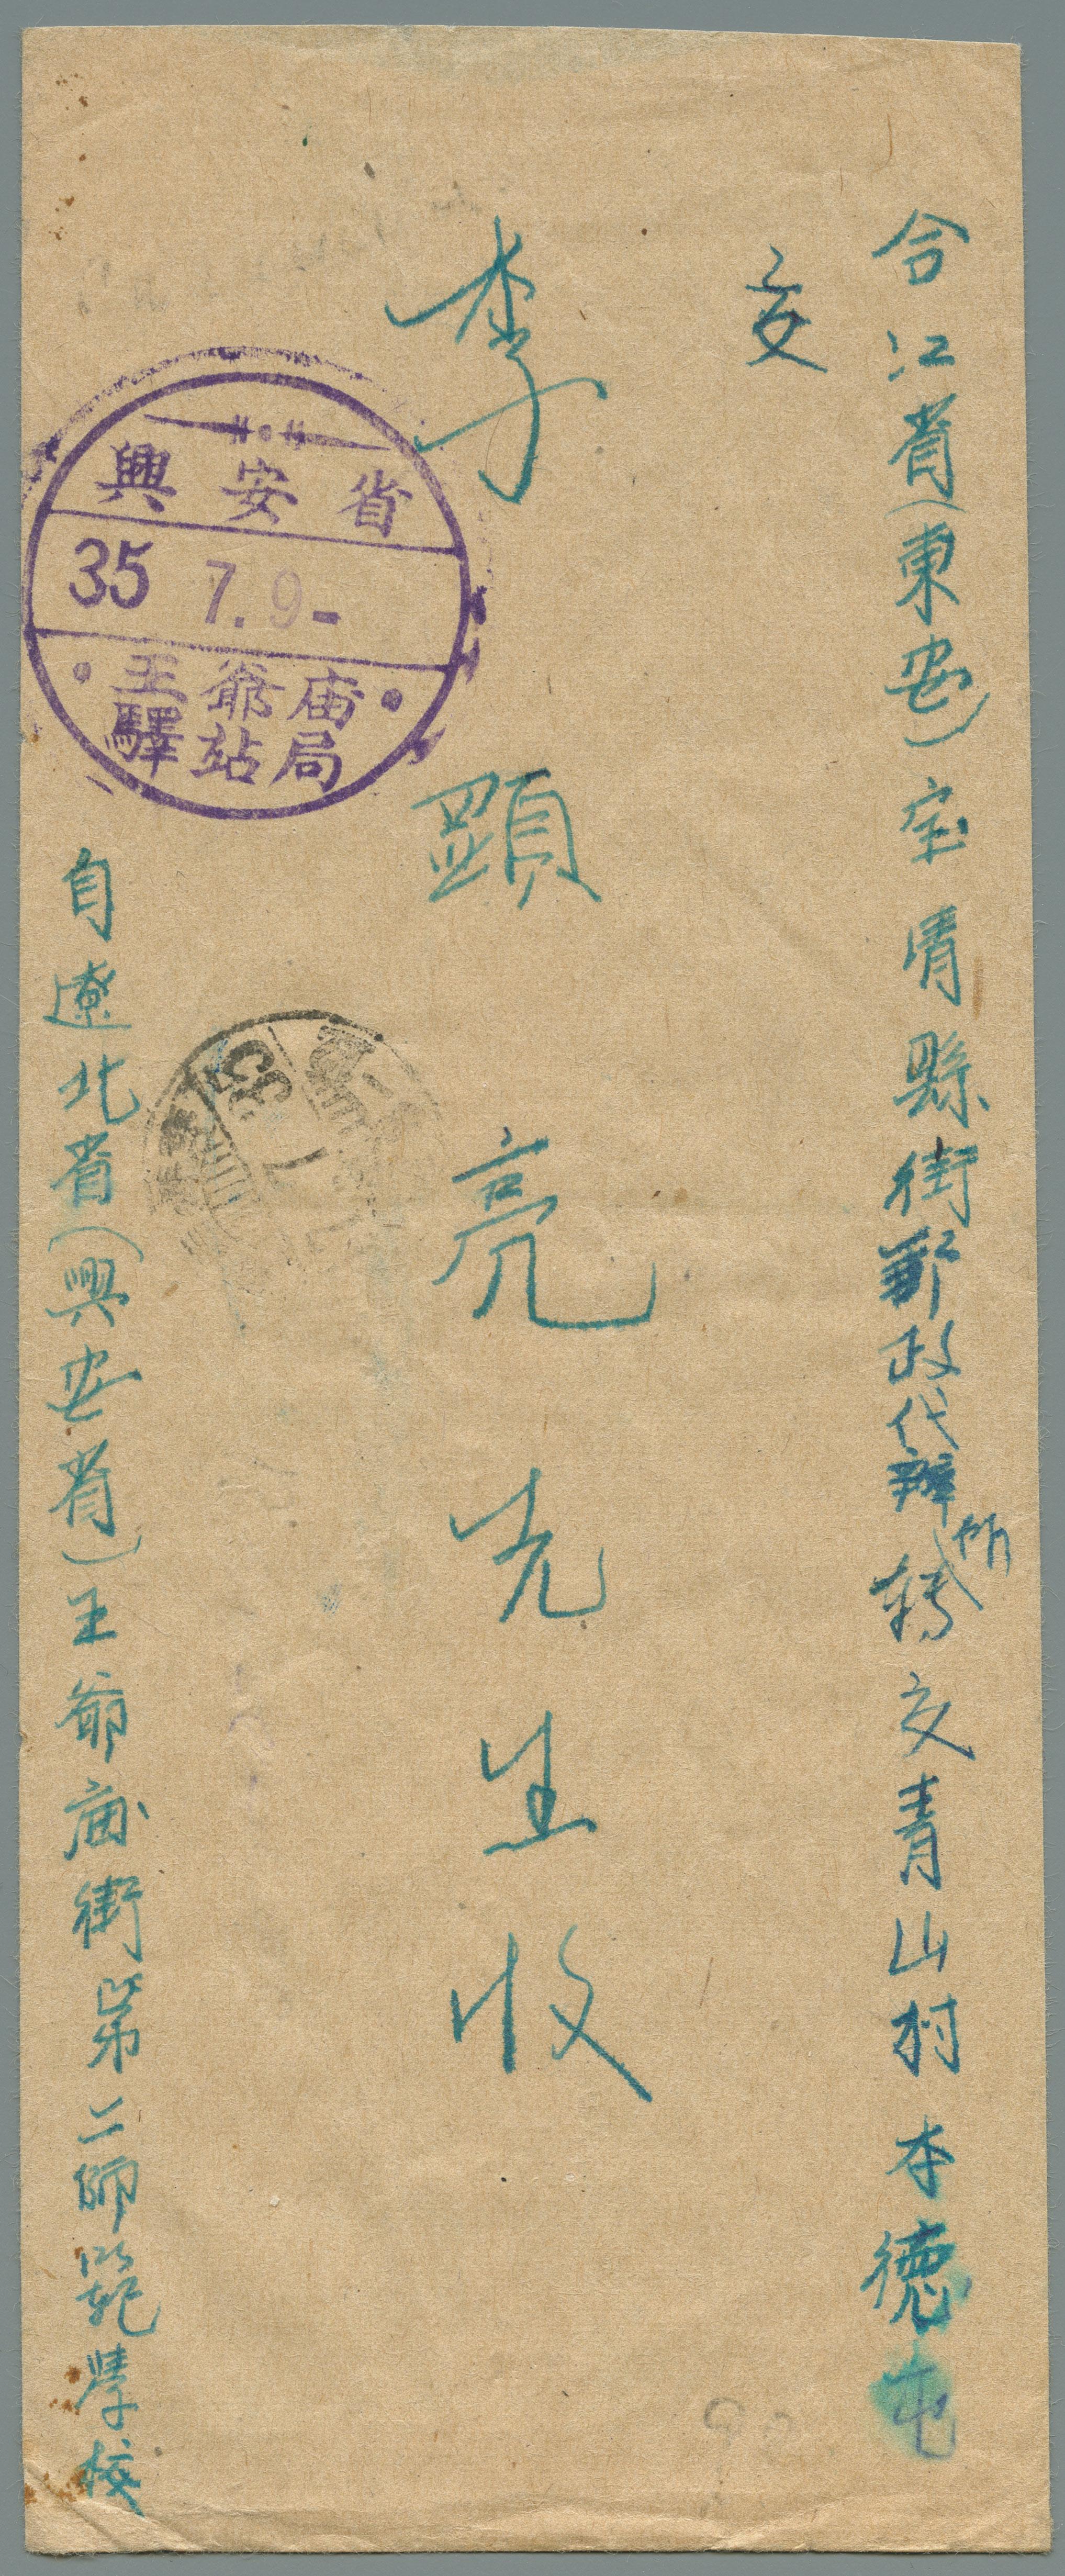 Inner-Mongolia-(內蒙古自治區)-Local-Issue,-Wangyemiao-(王爺庙)---1